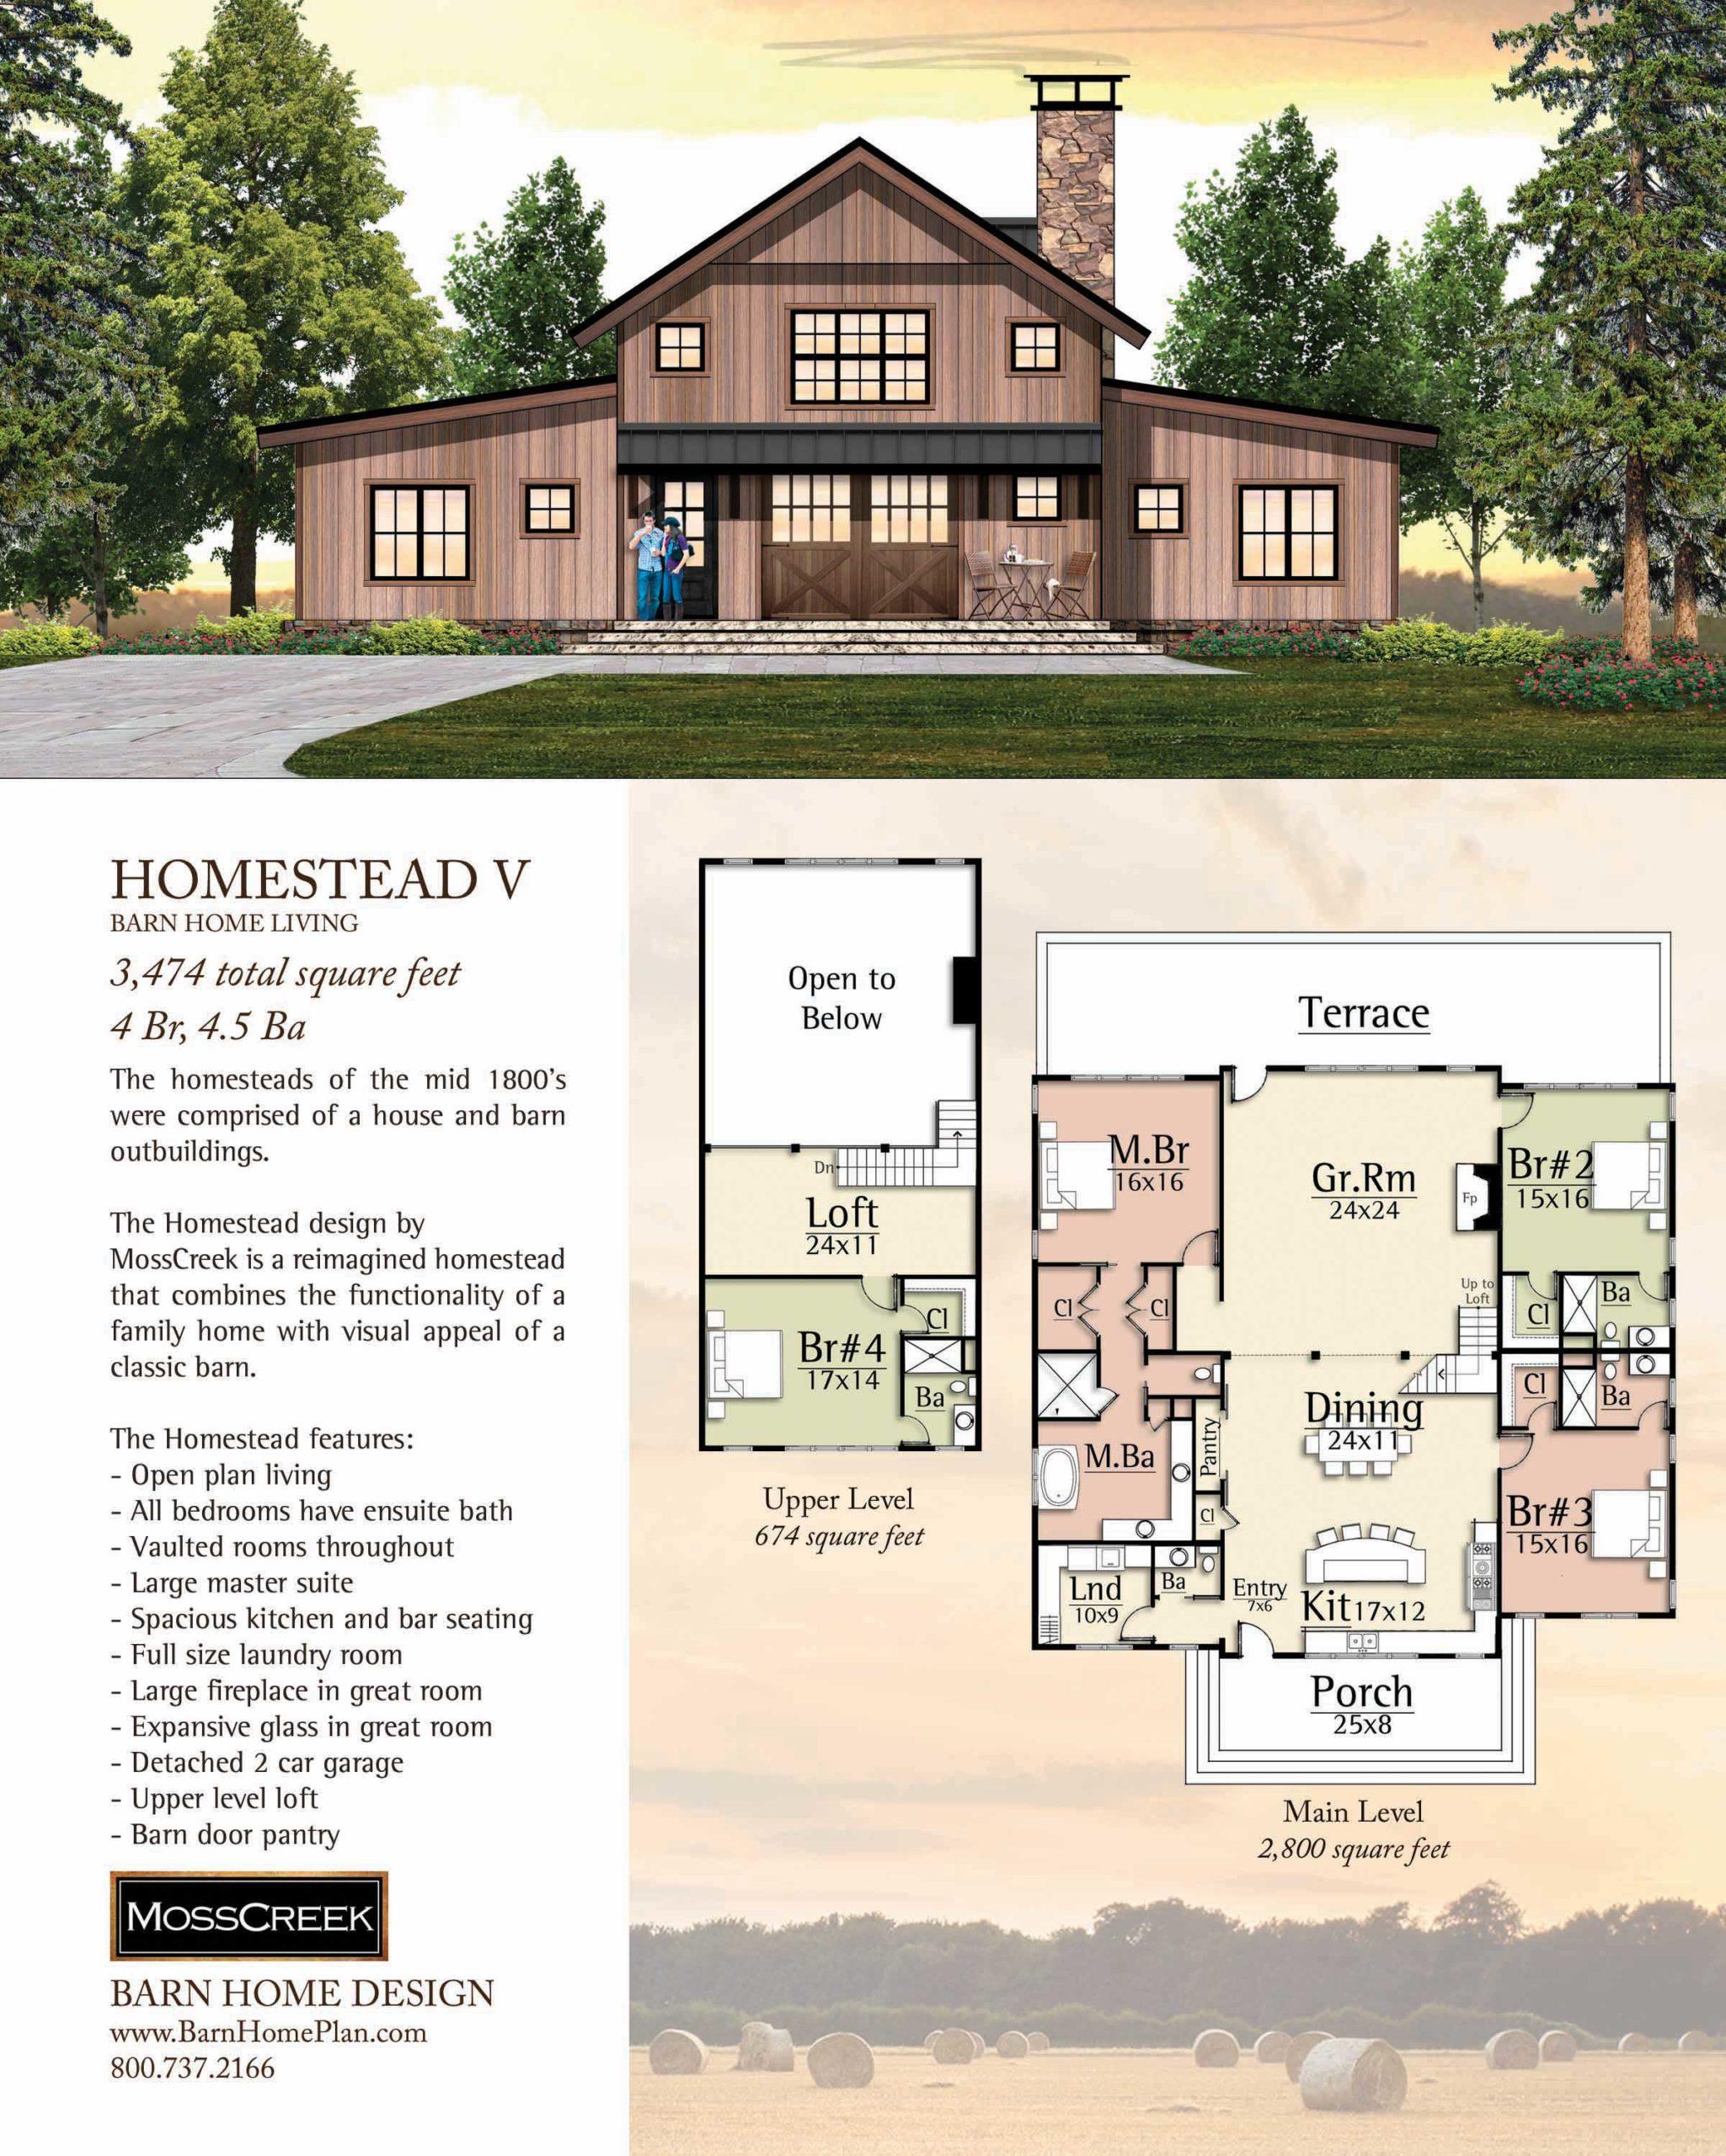 Mosscreek Homestead V Floorplan